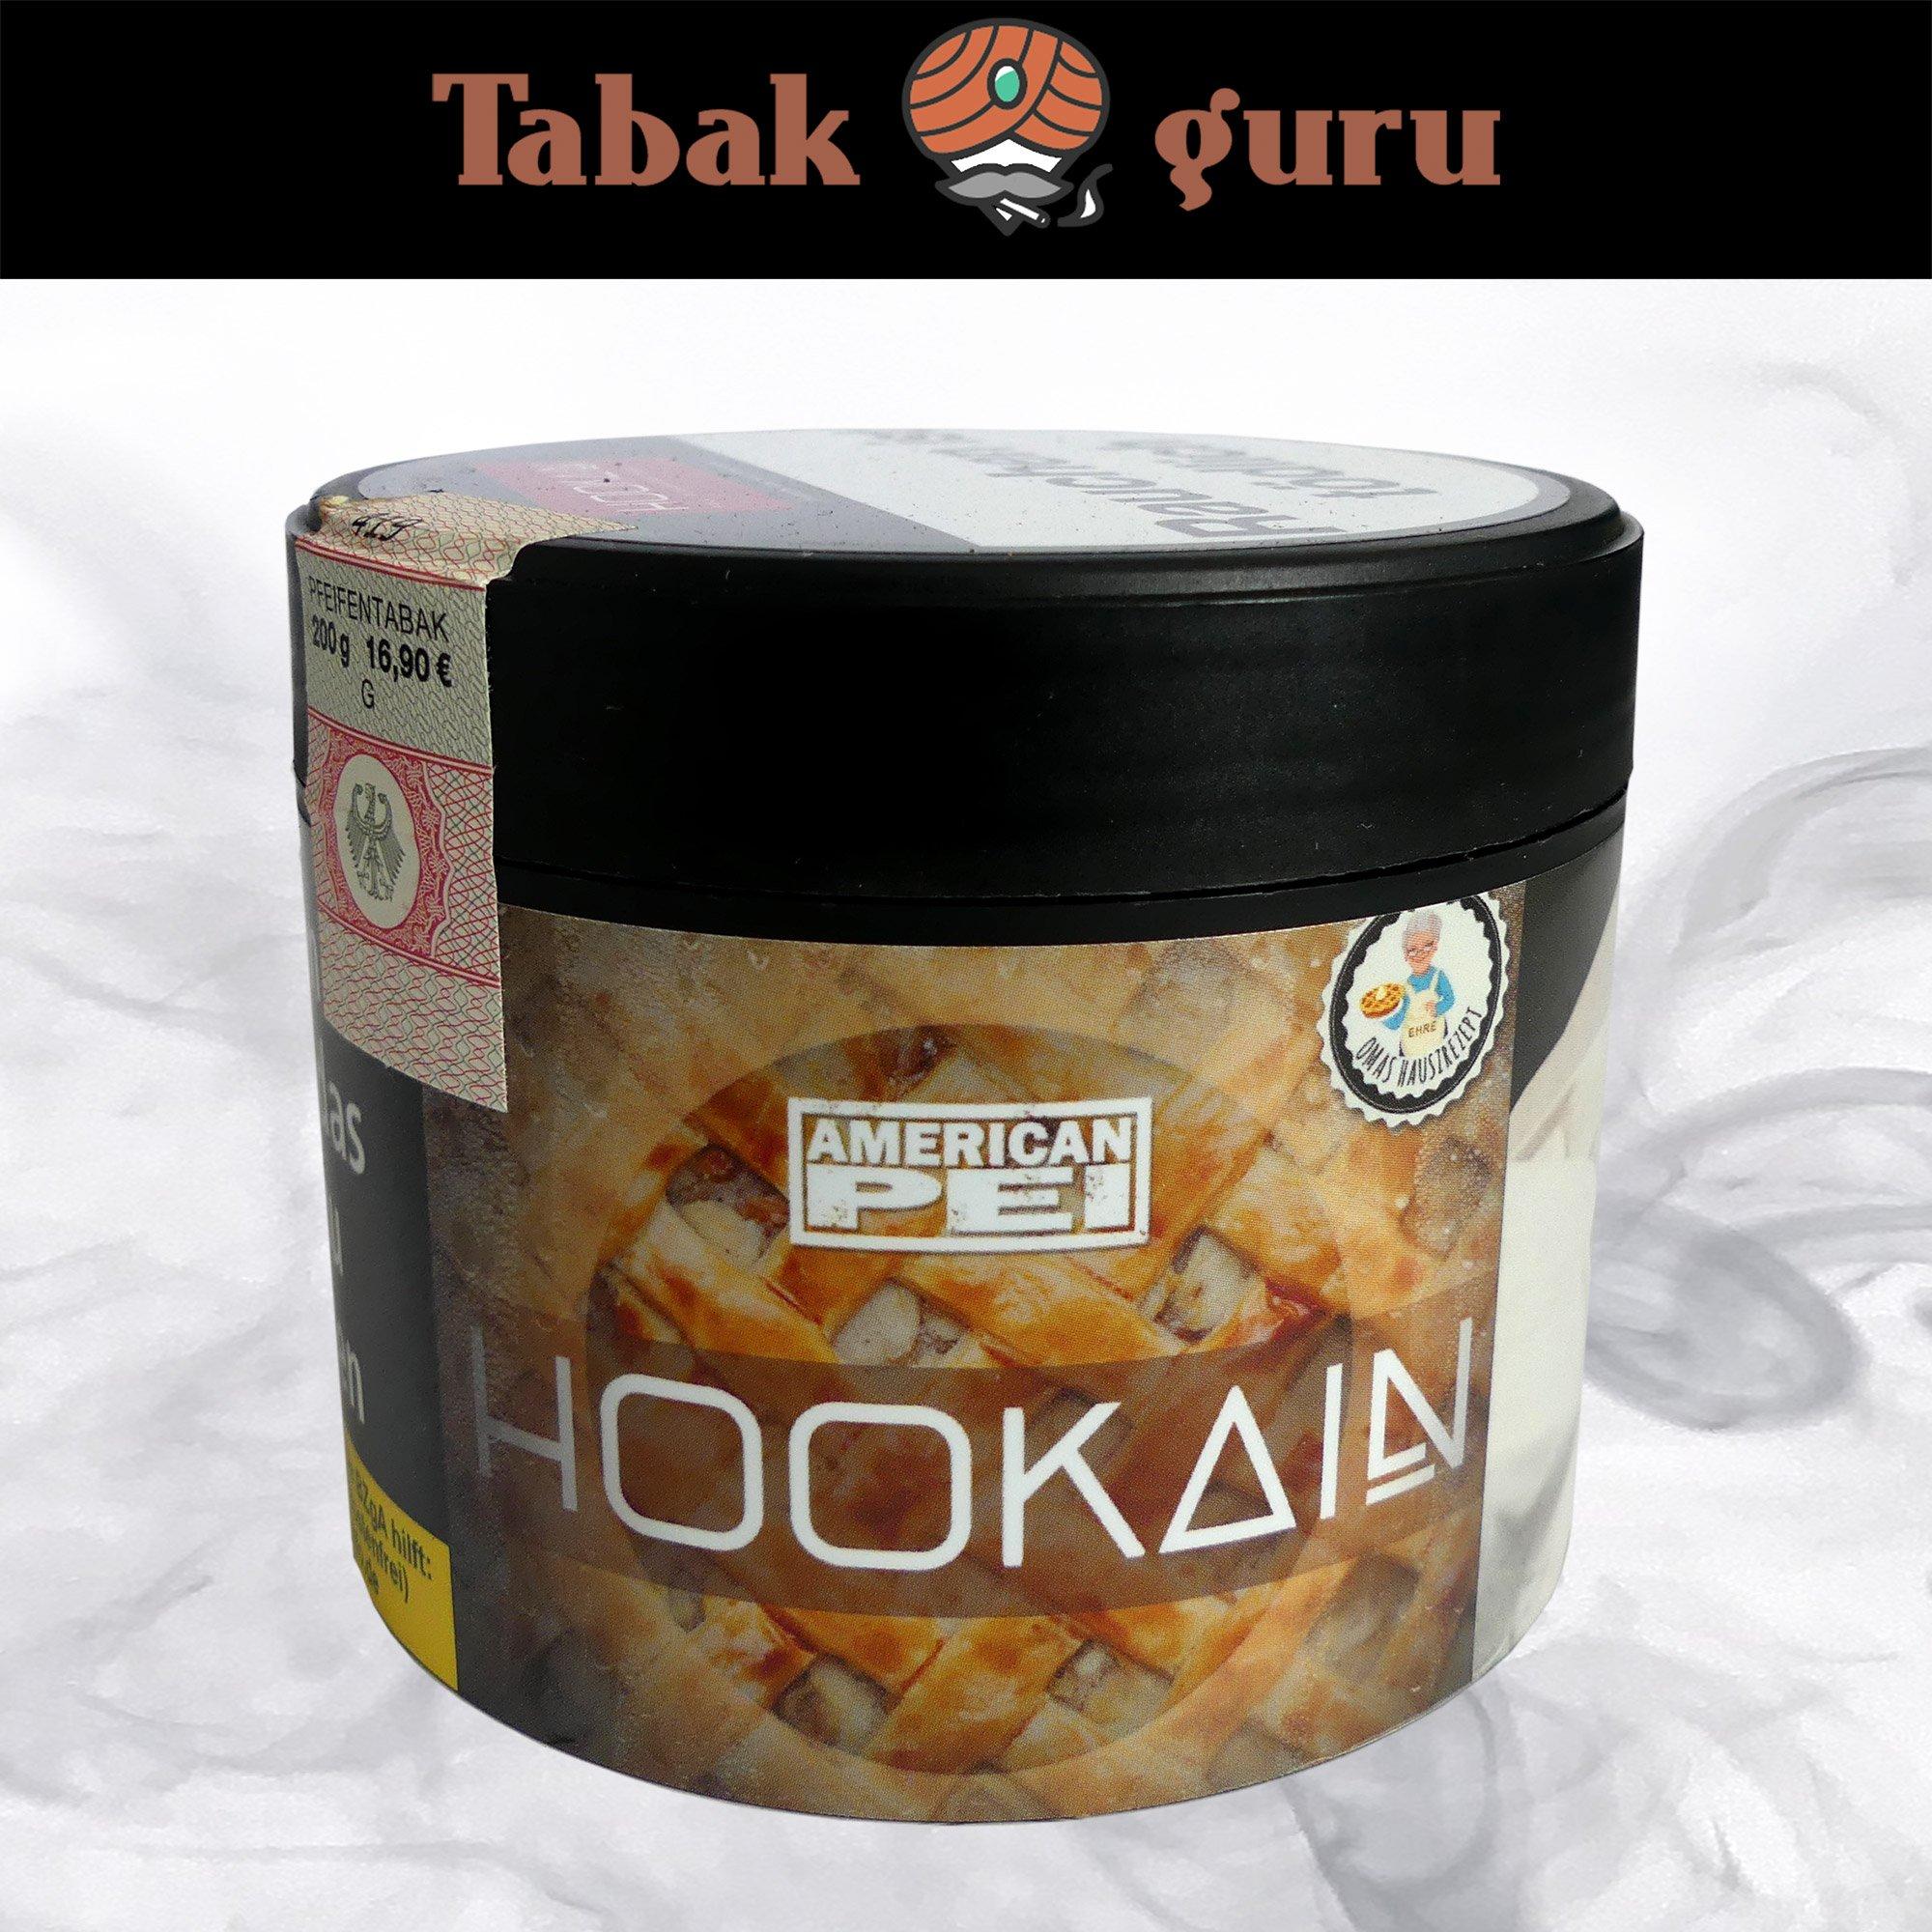 Hookain American Pei 200g - Shisha Tabak